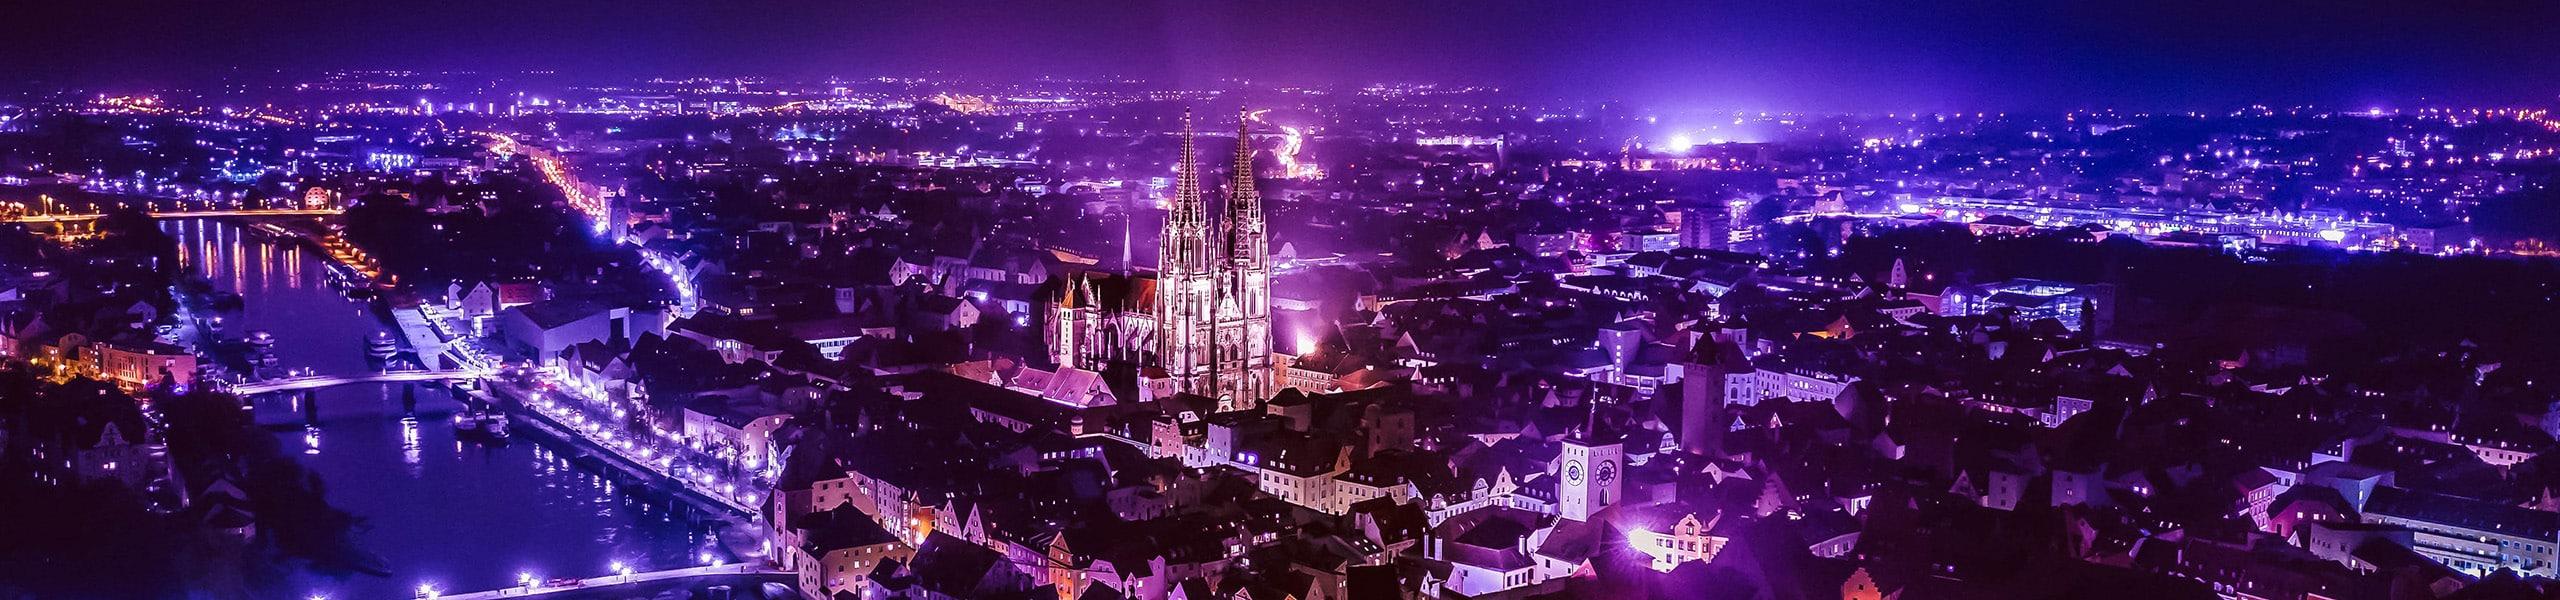 fotowettbewerb_november_oberpfalz-bei-nacht_harald-huenn